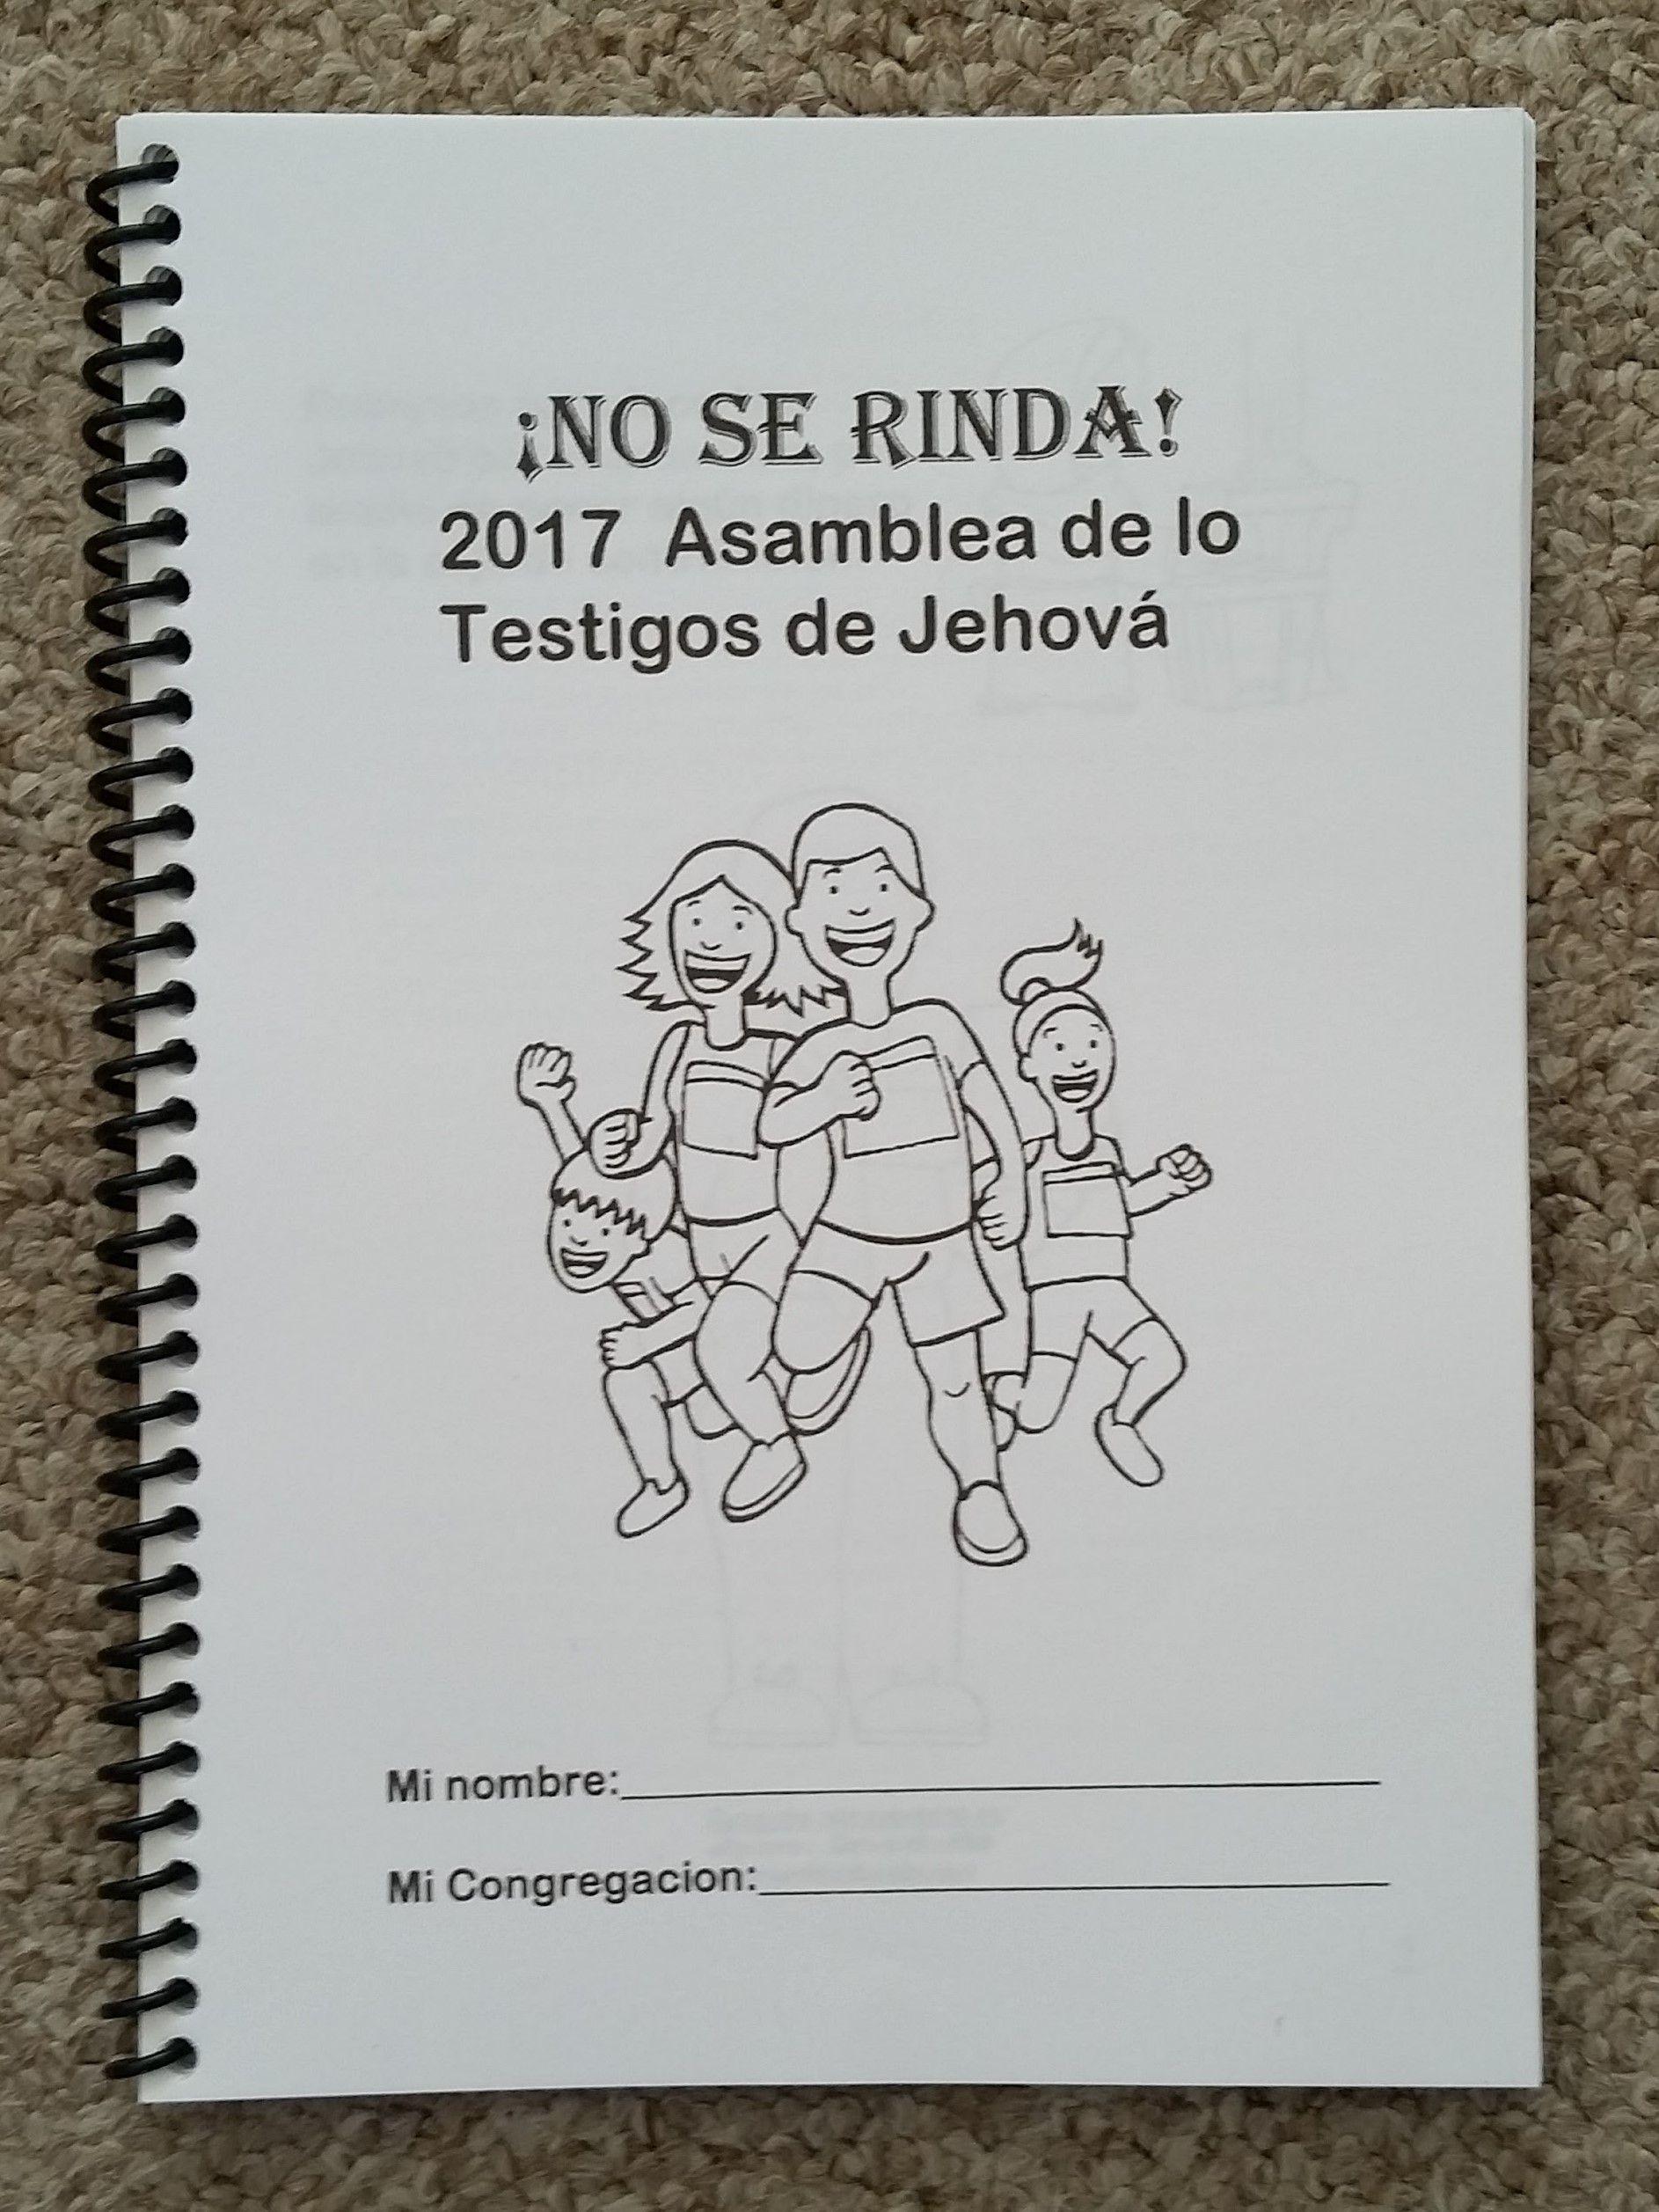 Spanish Jw Regional Convention No Se Rinda Asamblea Notebook For Teens And Adults Espanol